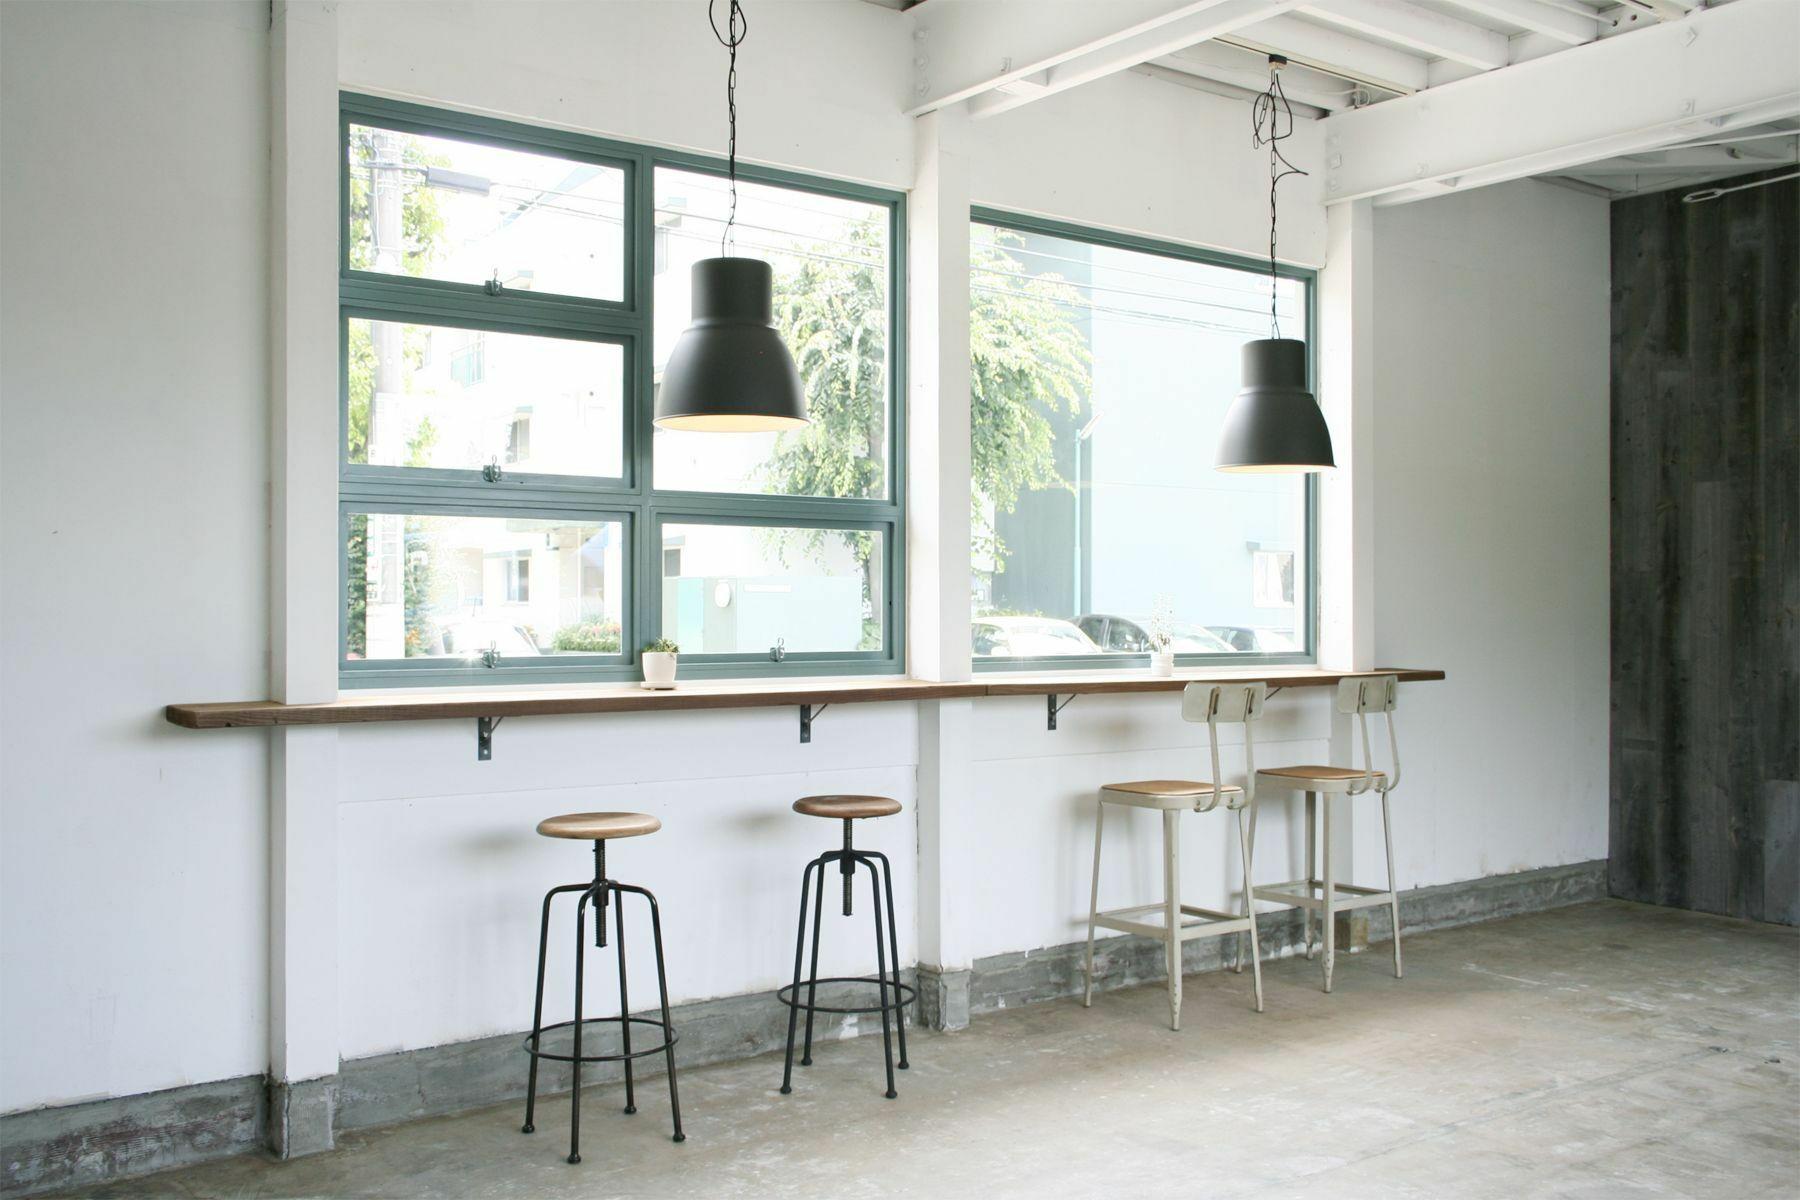 E-standard(イースタンダード)2F